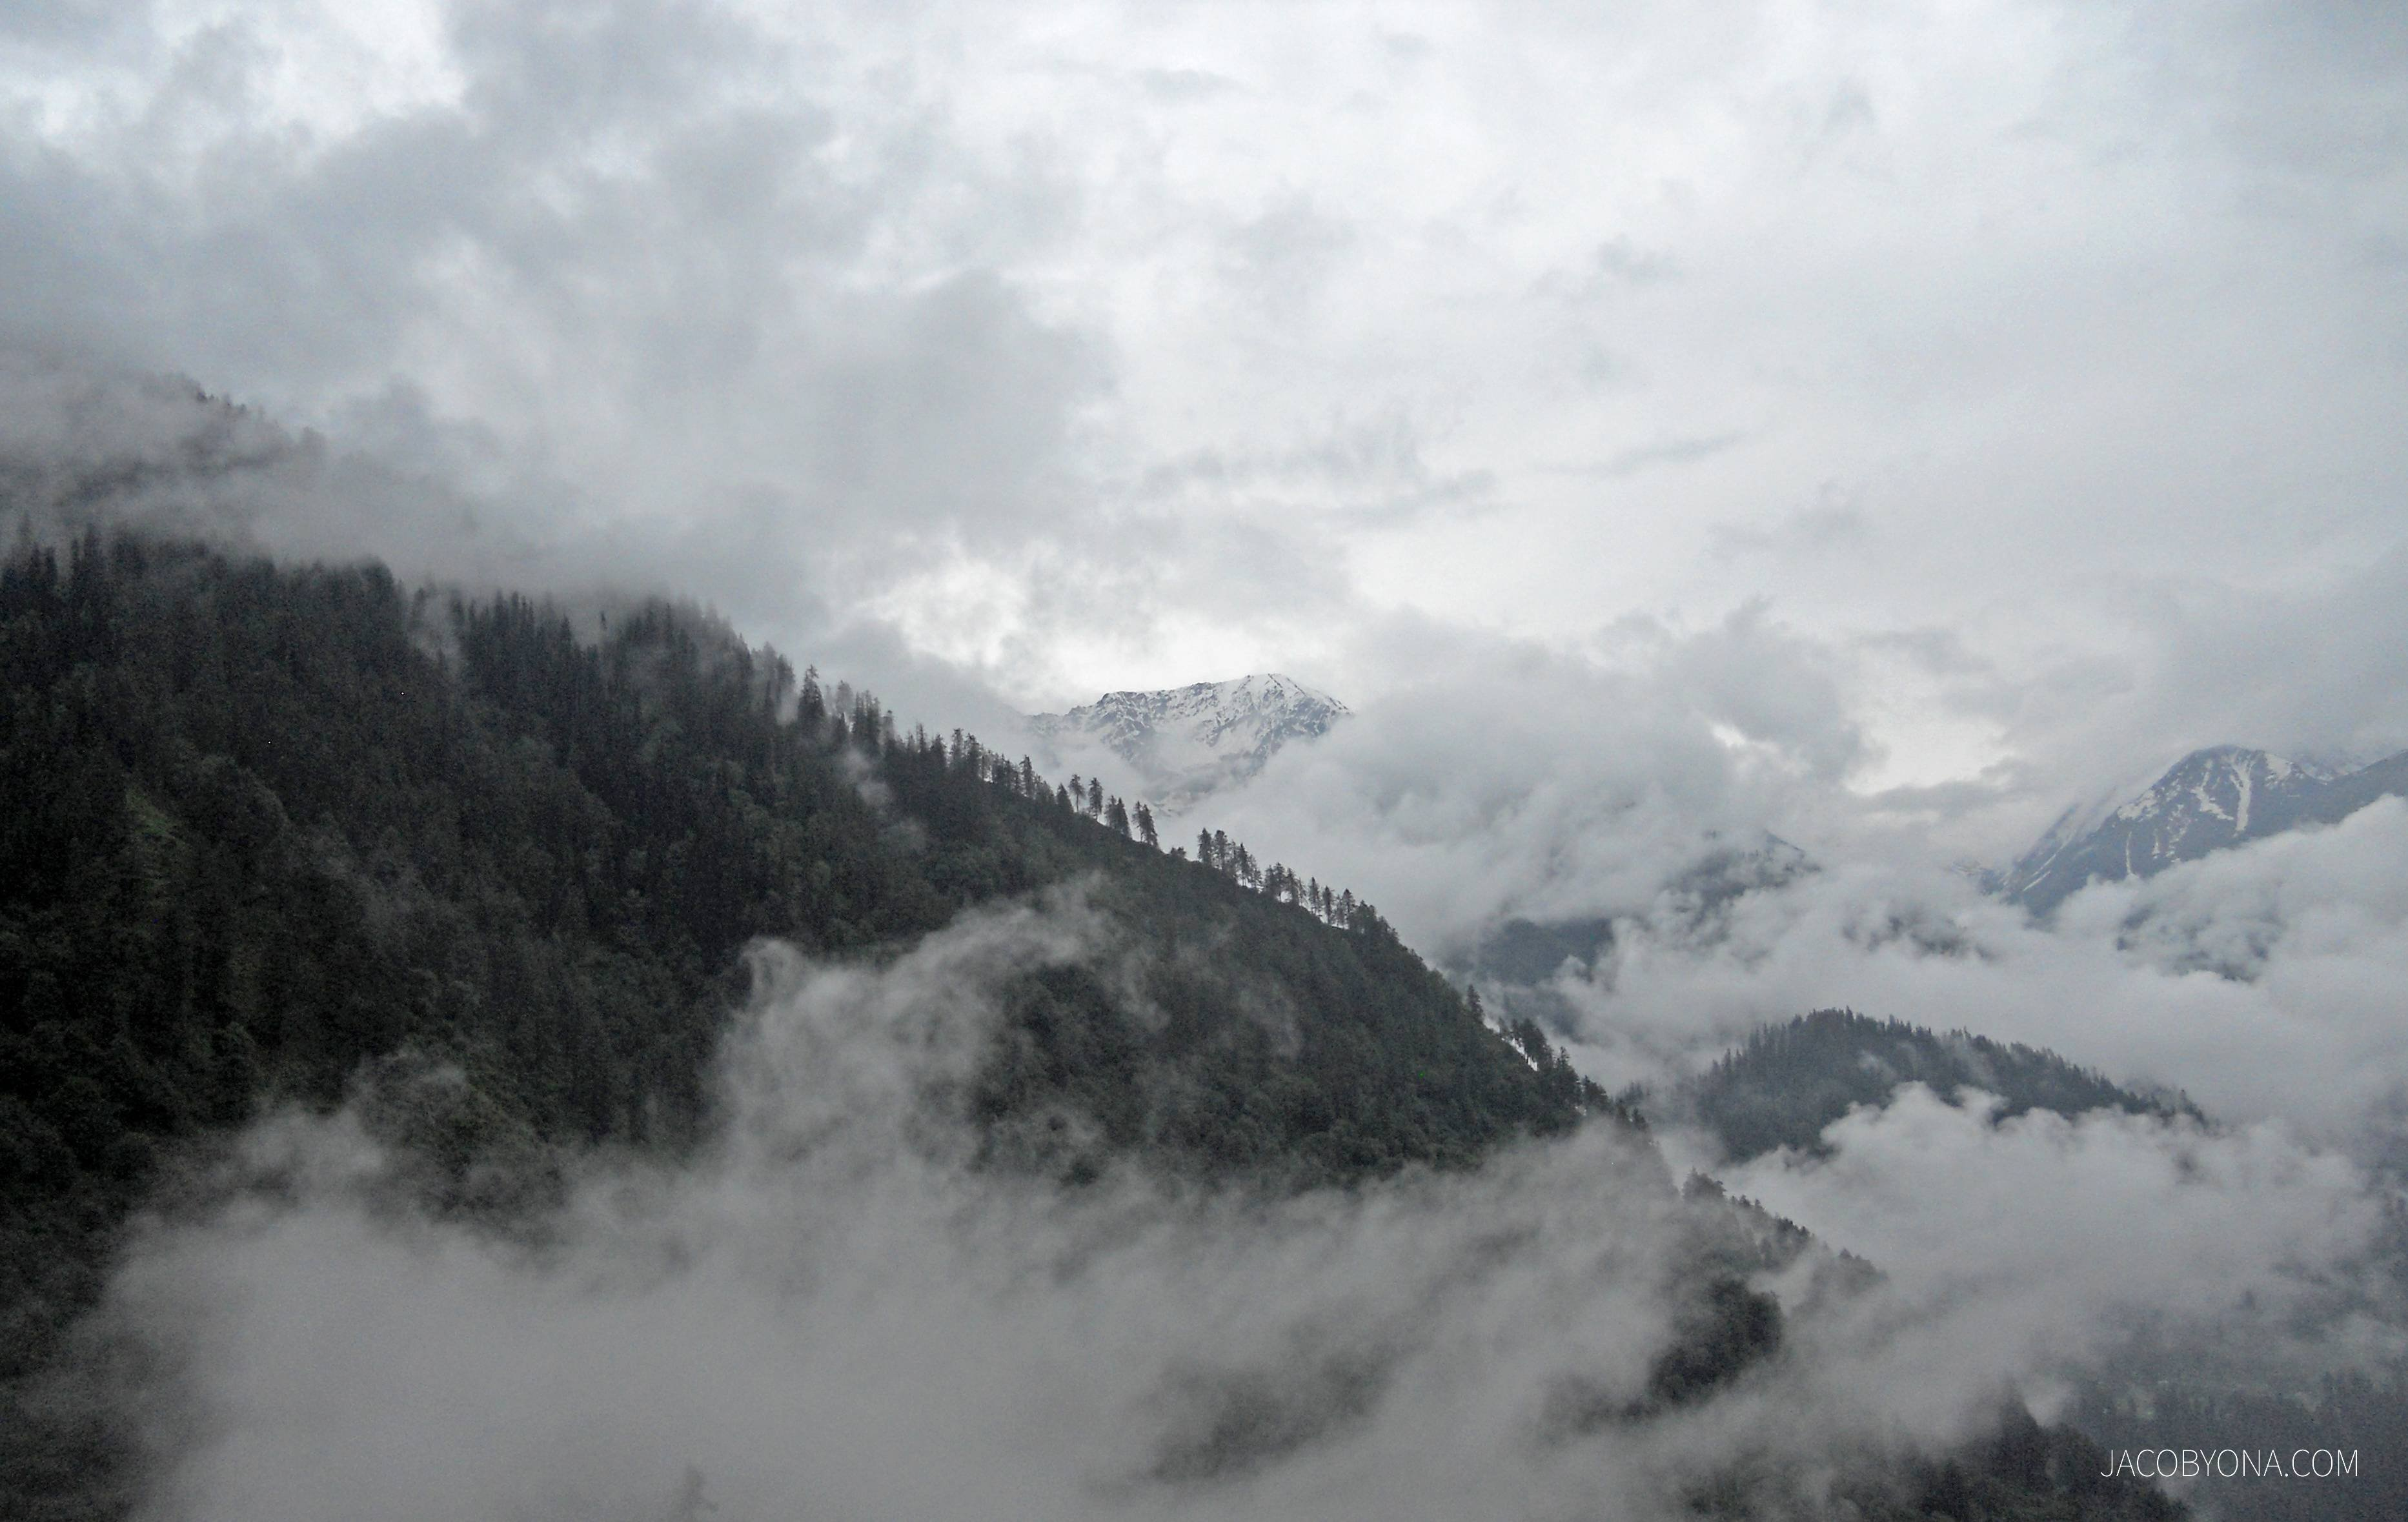 Tosh Himachal Pradesh India HD Wallpaper